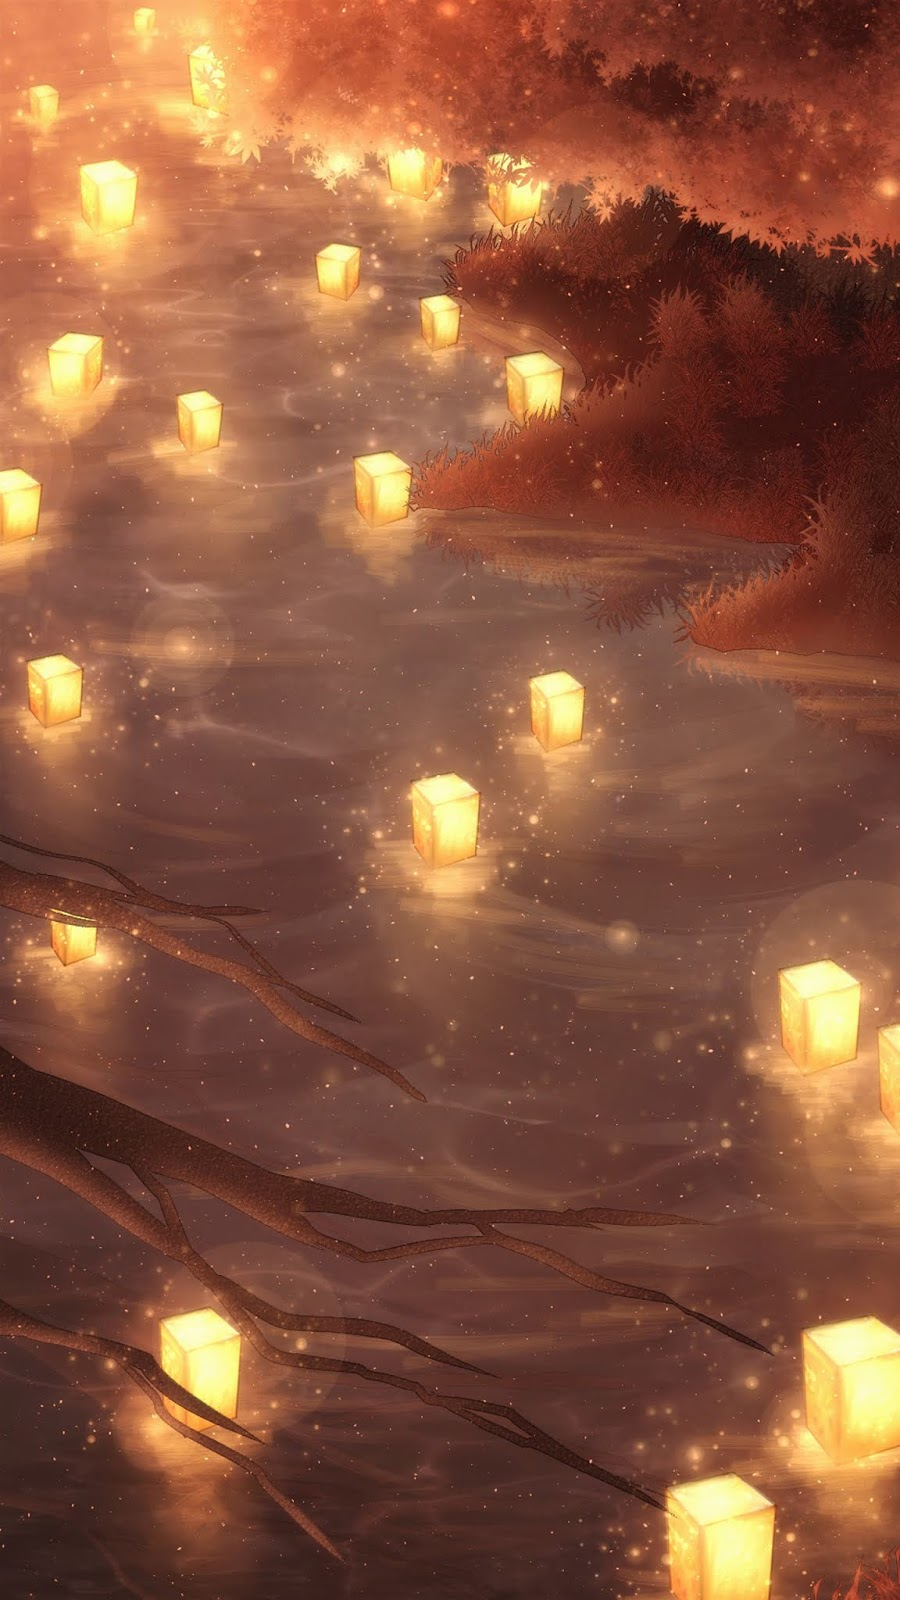 A river of light wallpaper